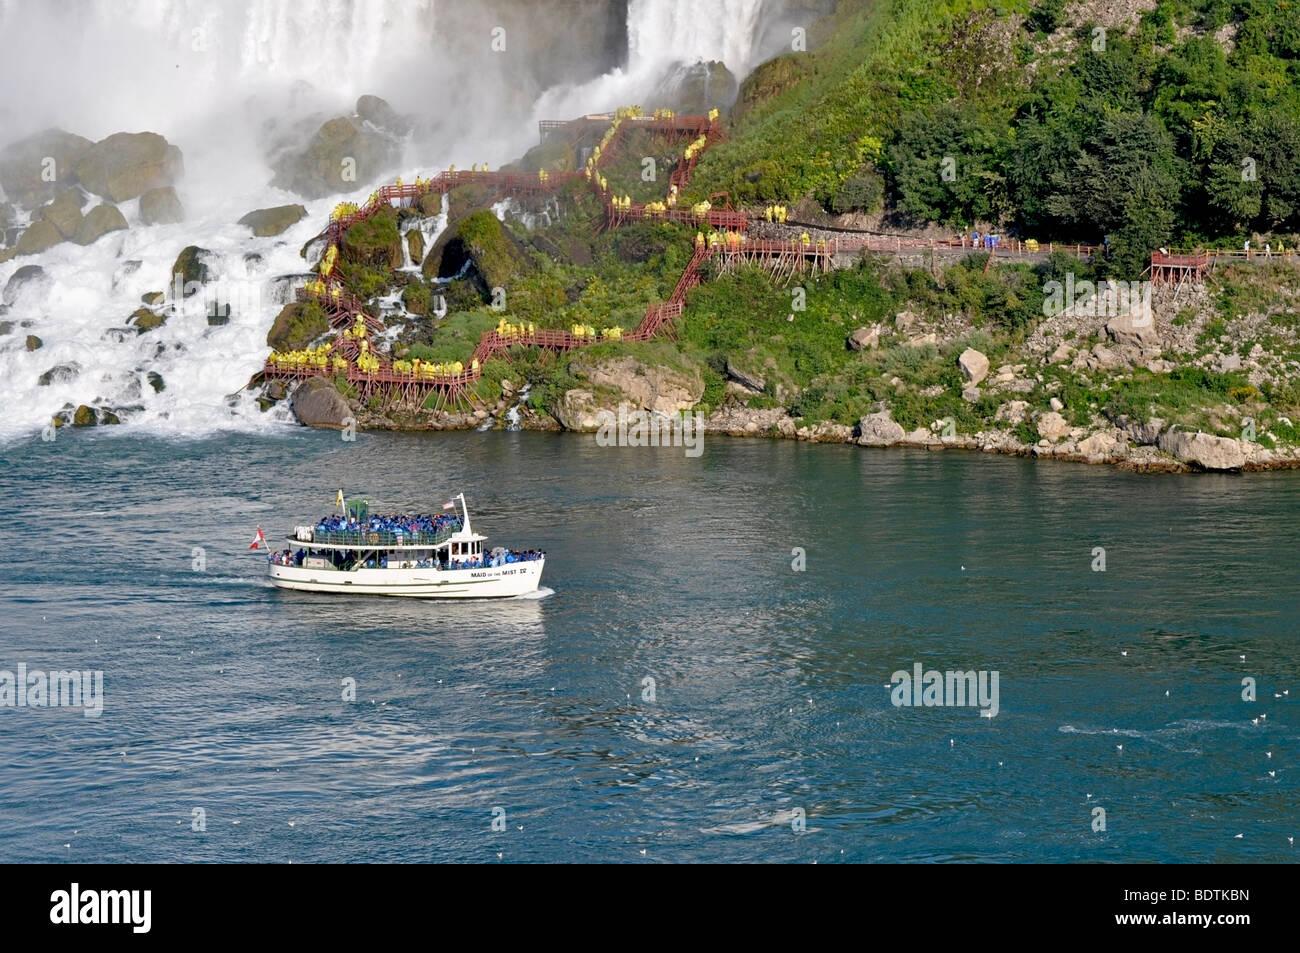 Magd des Bootes Nebel mit Touristen, Niagara Falls, Kanada Stockbild